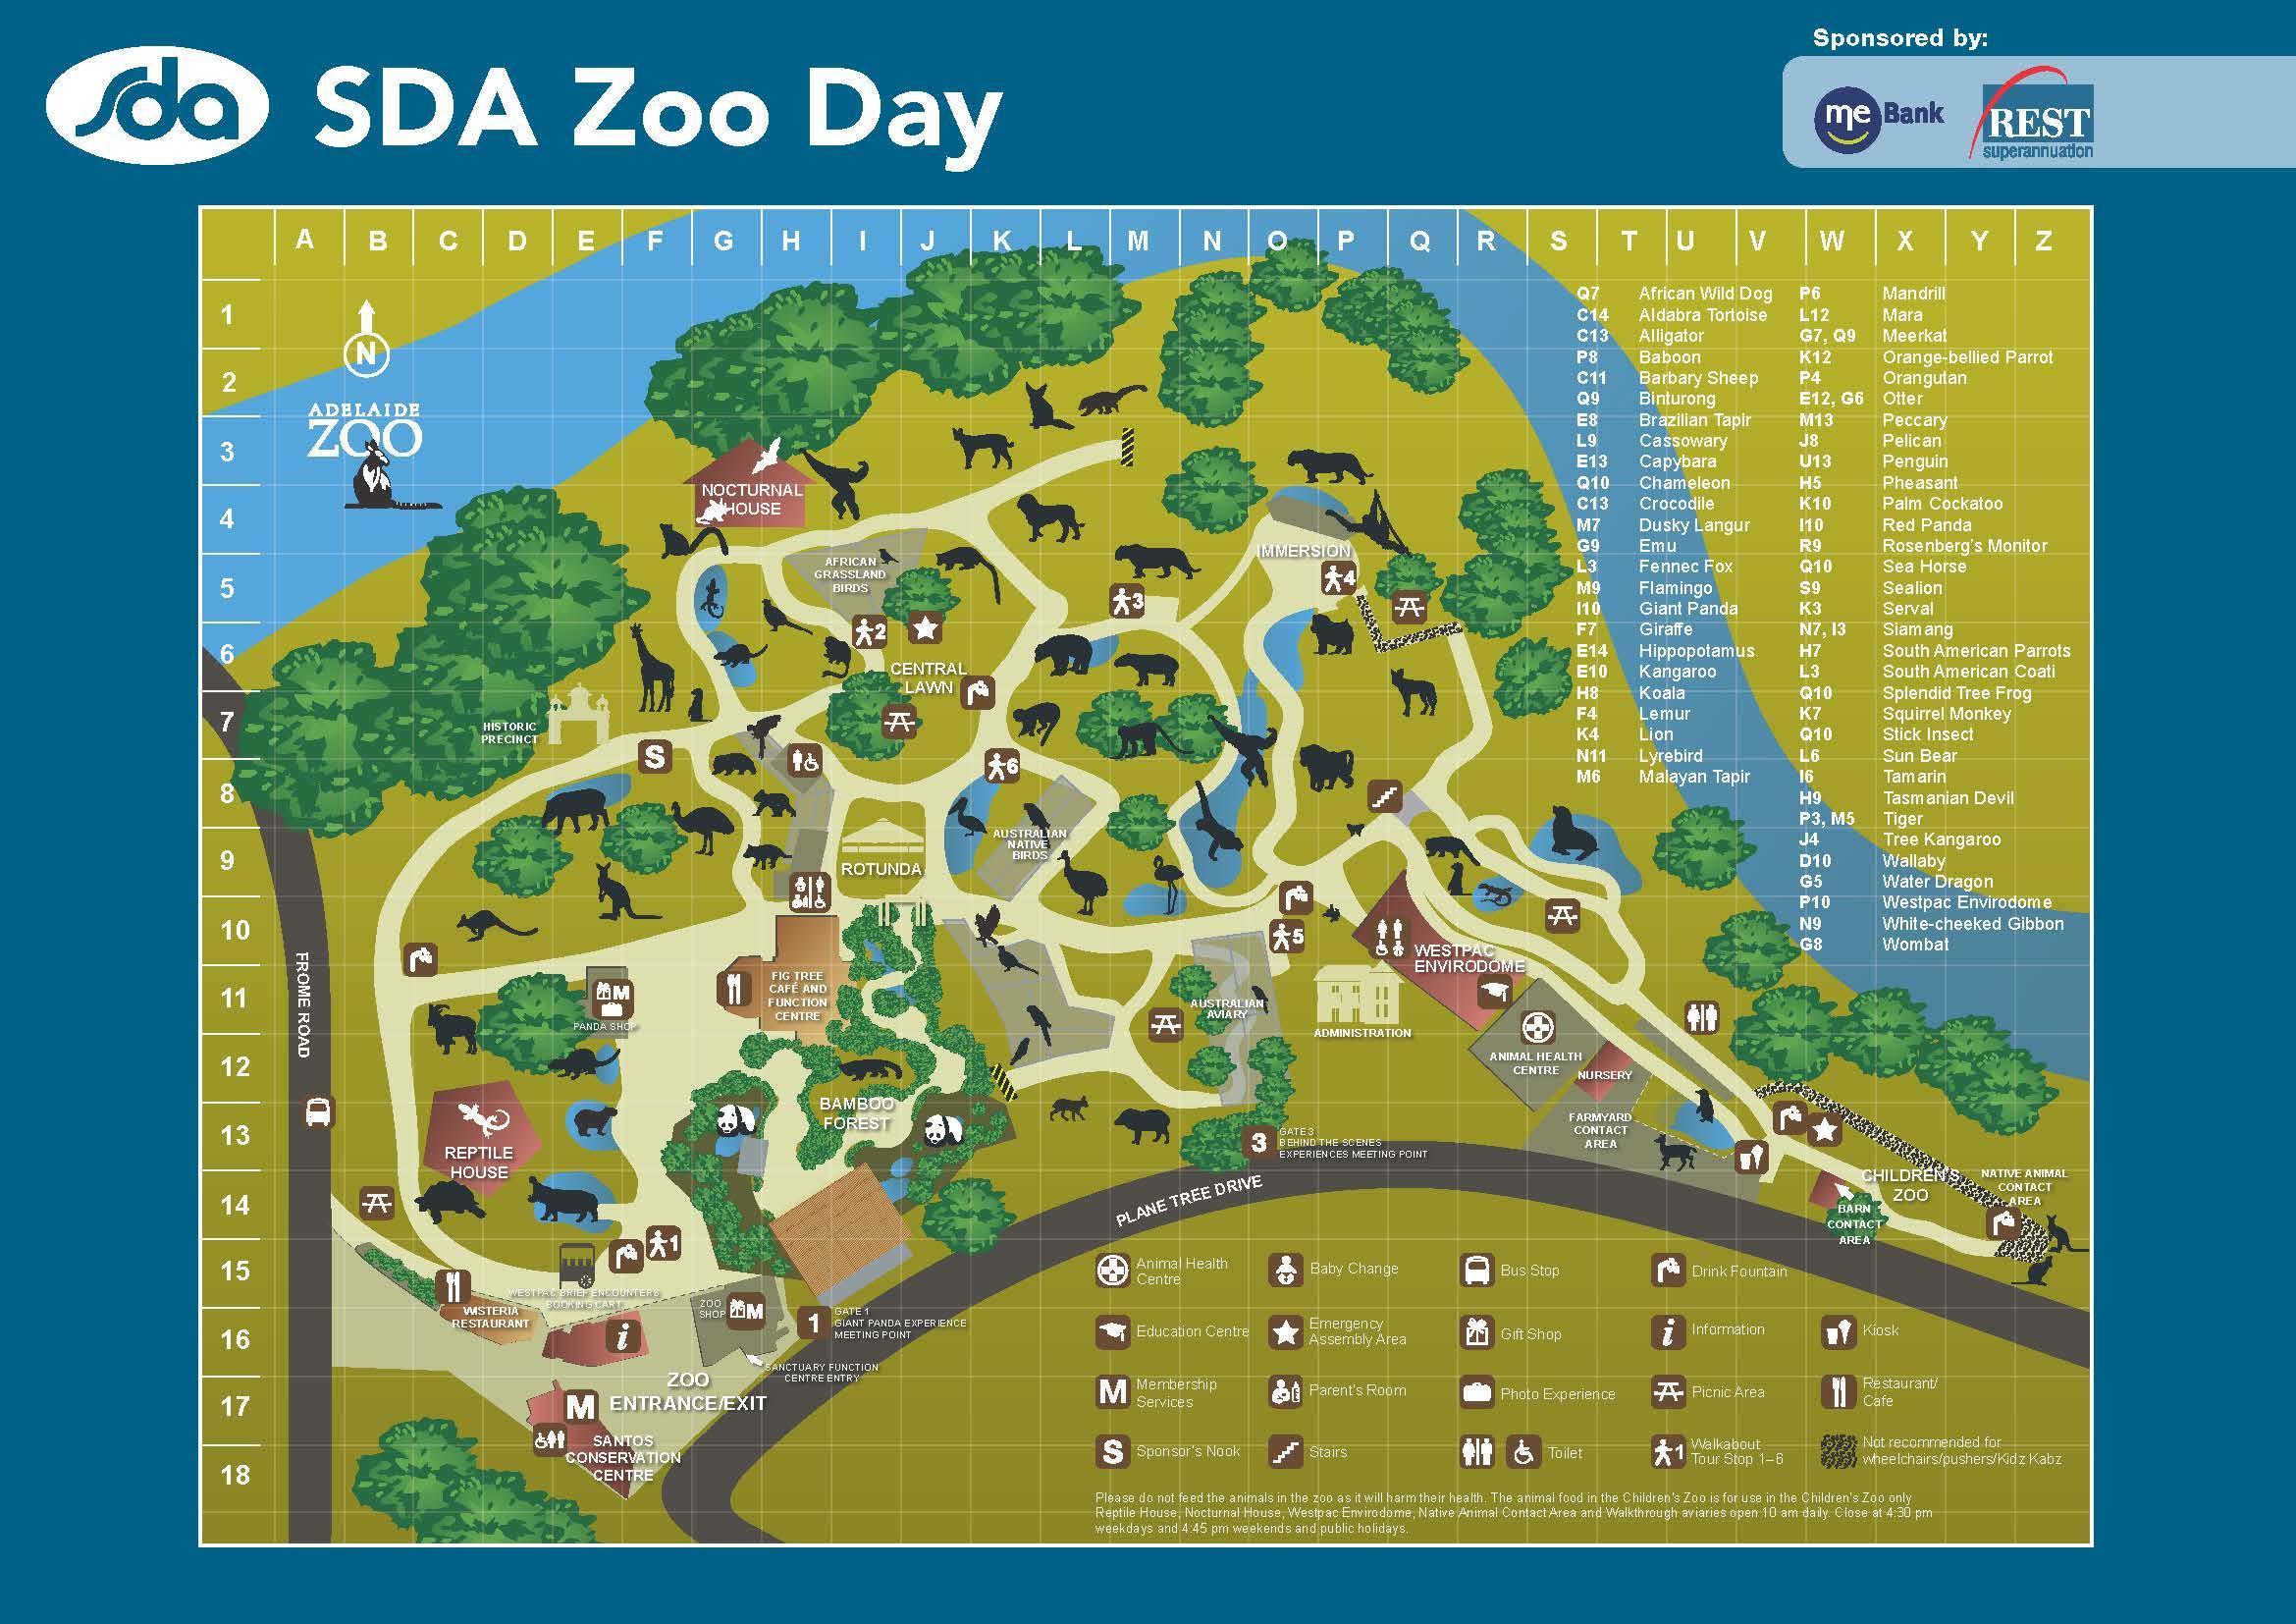 SDA Zoo Day turns 20 this weekend SDA SA NT Branch